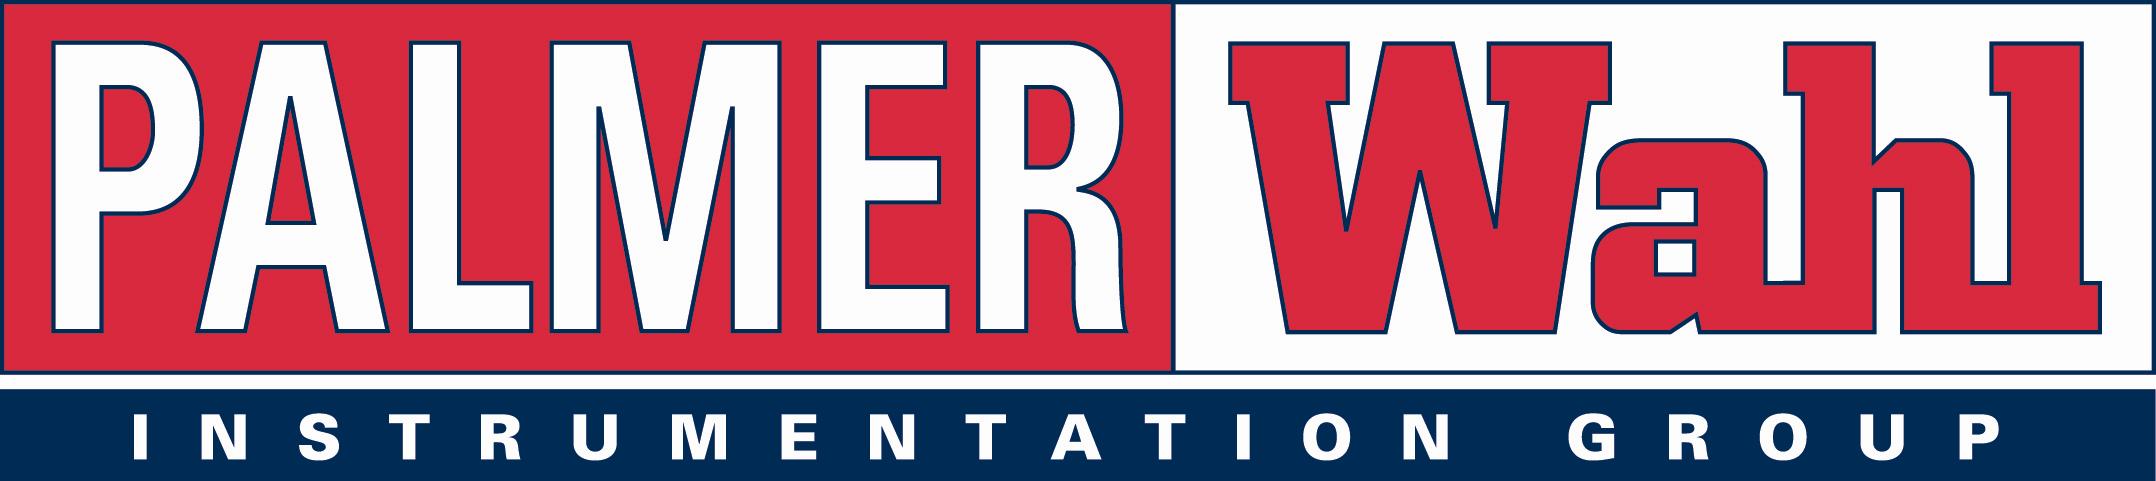 palmerwahl-high-res-logo.png